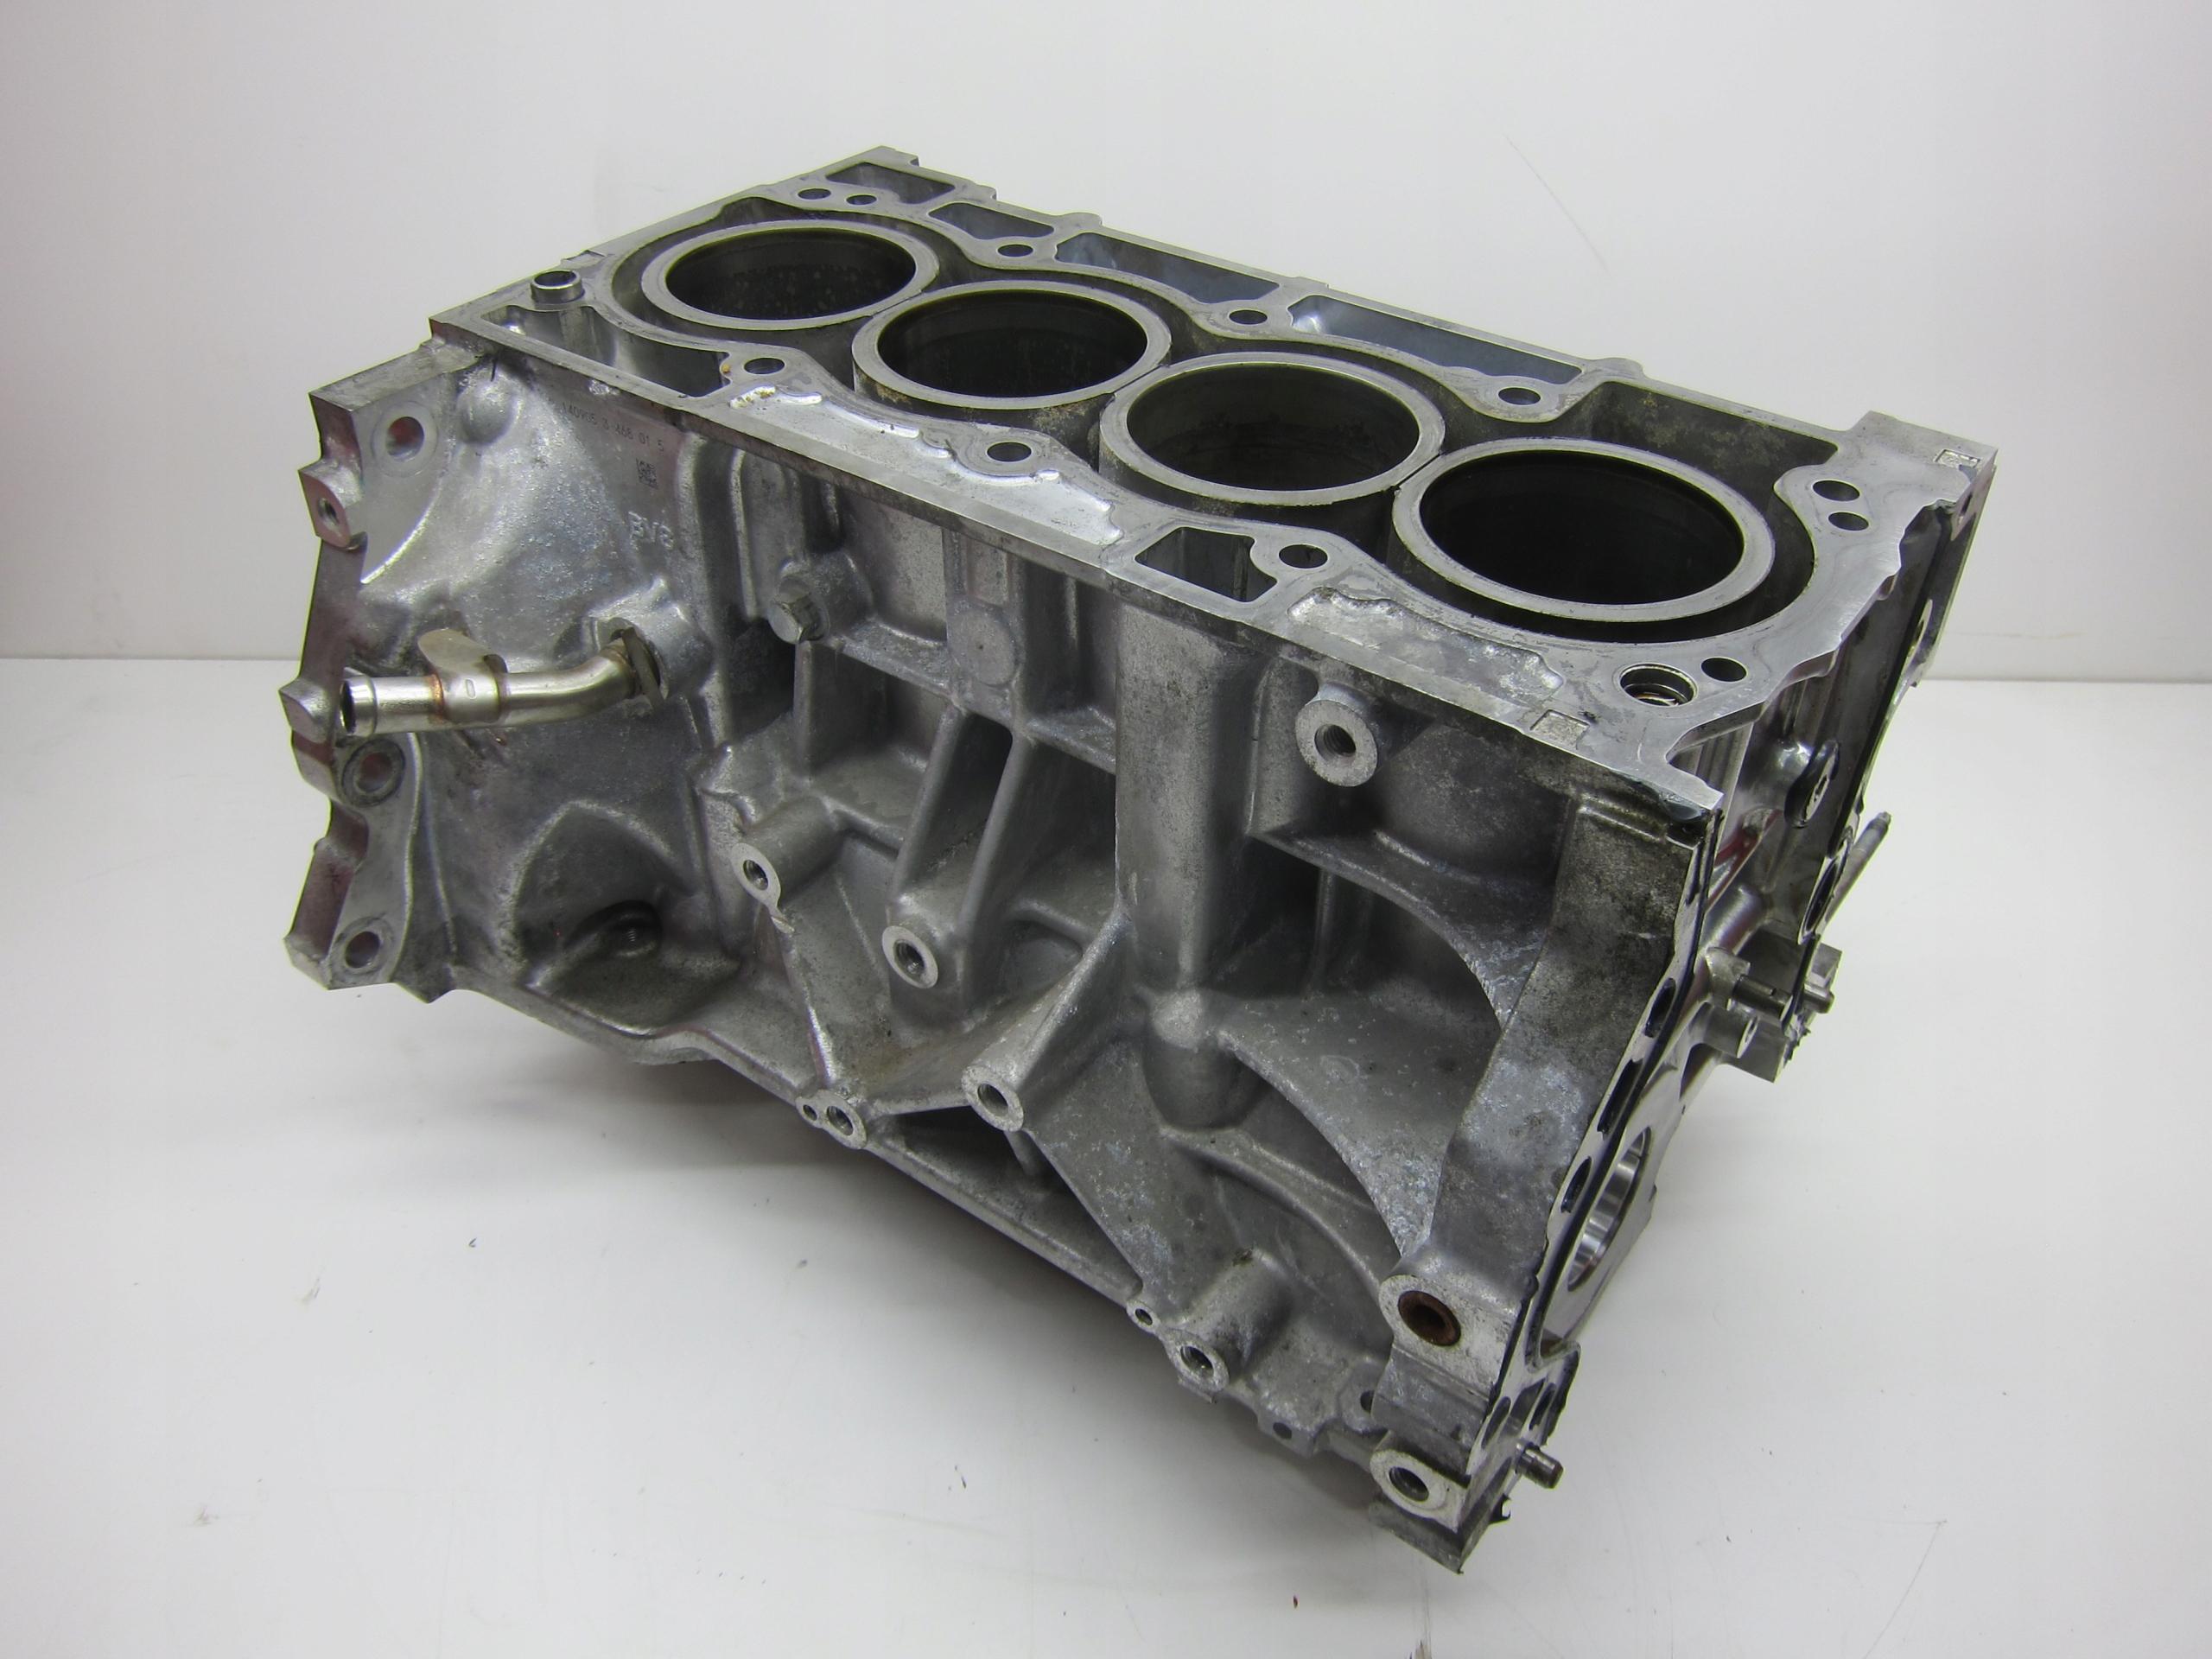 блок двигателя renault nissan 1 6tce m5mb450 205km